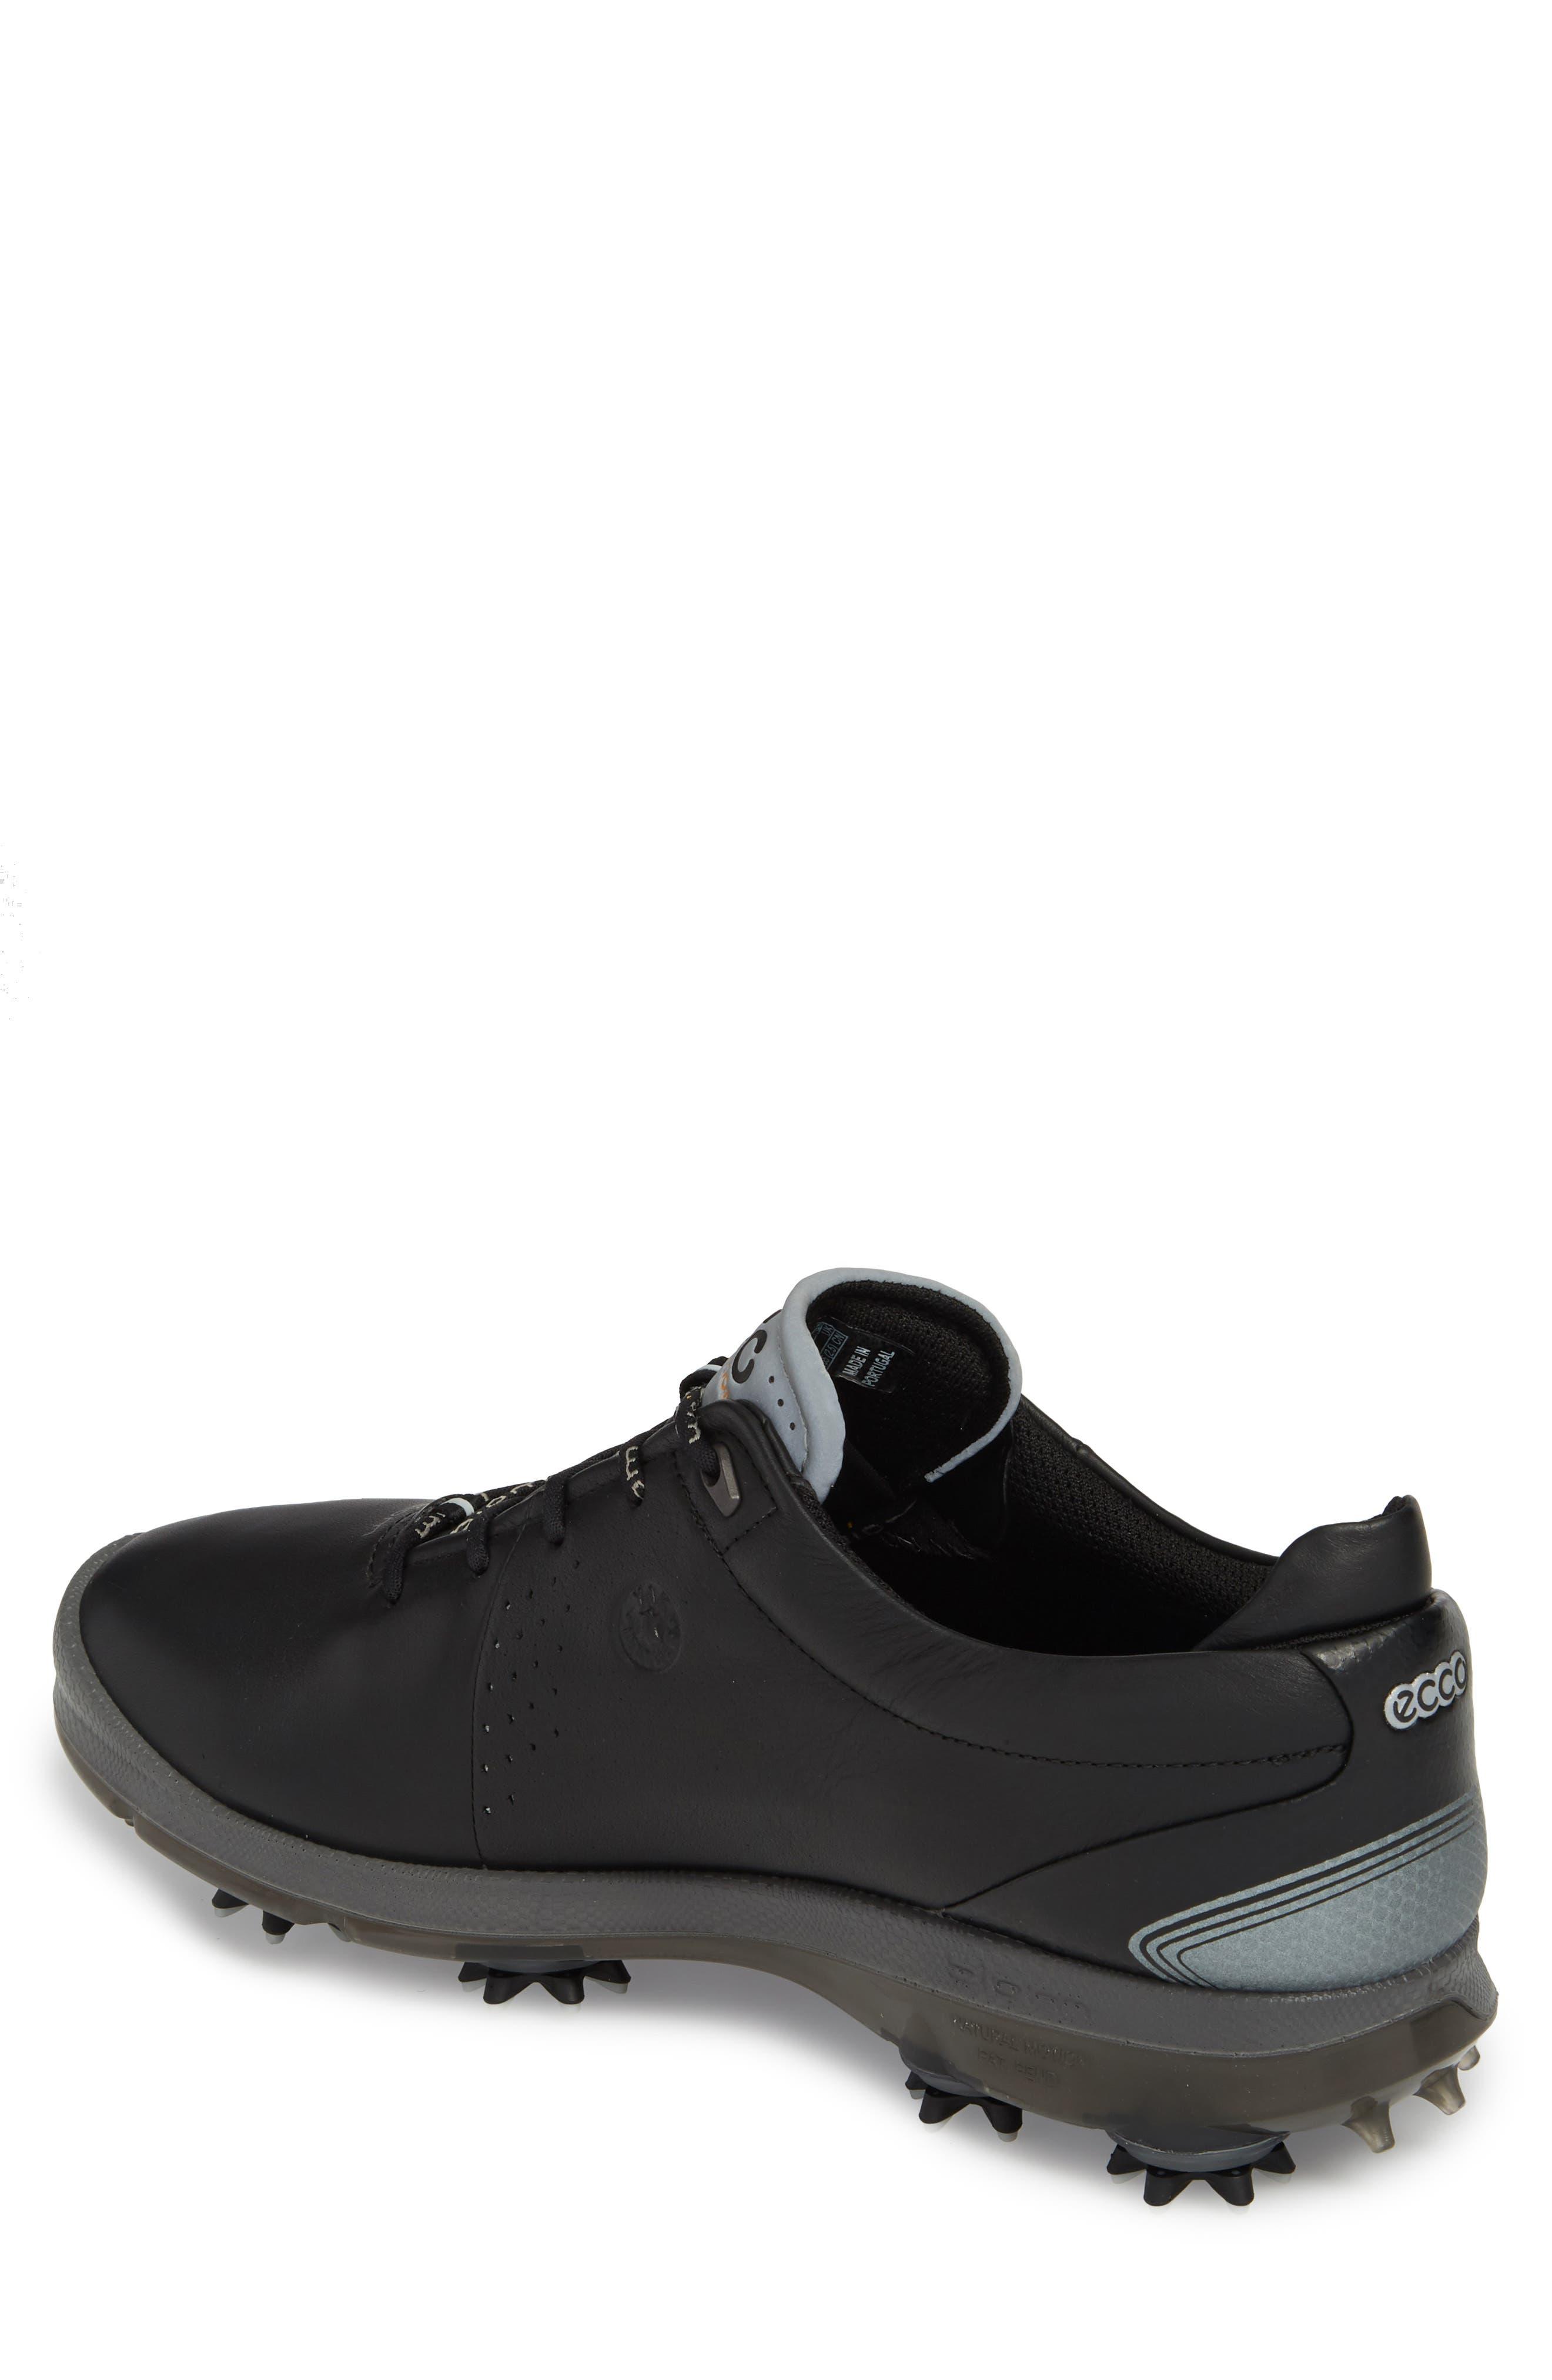 BIOM G 2 Free Gore-Tex<sup>®</sup> Golf Shoe,                             Alternate thumbnail 2, color,                             001